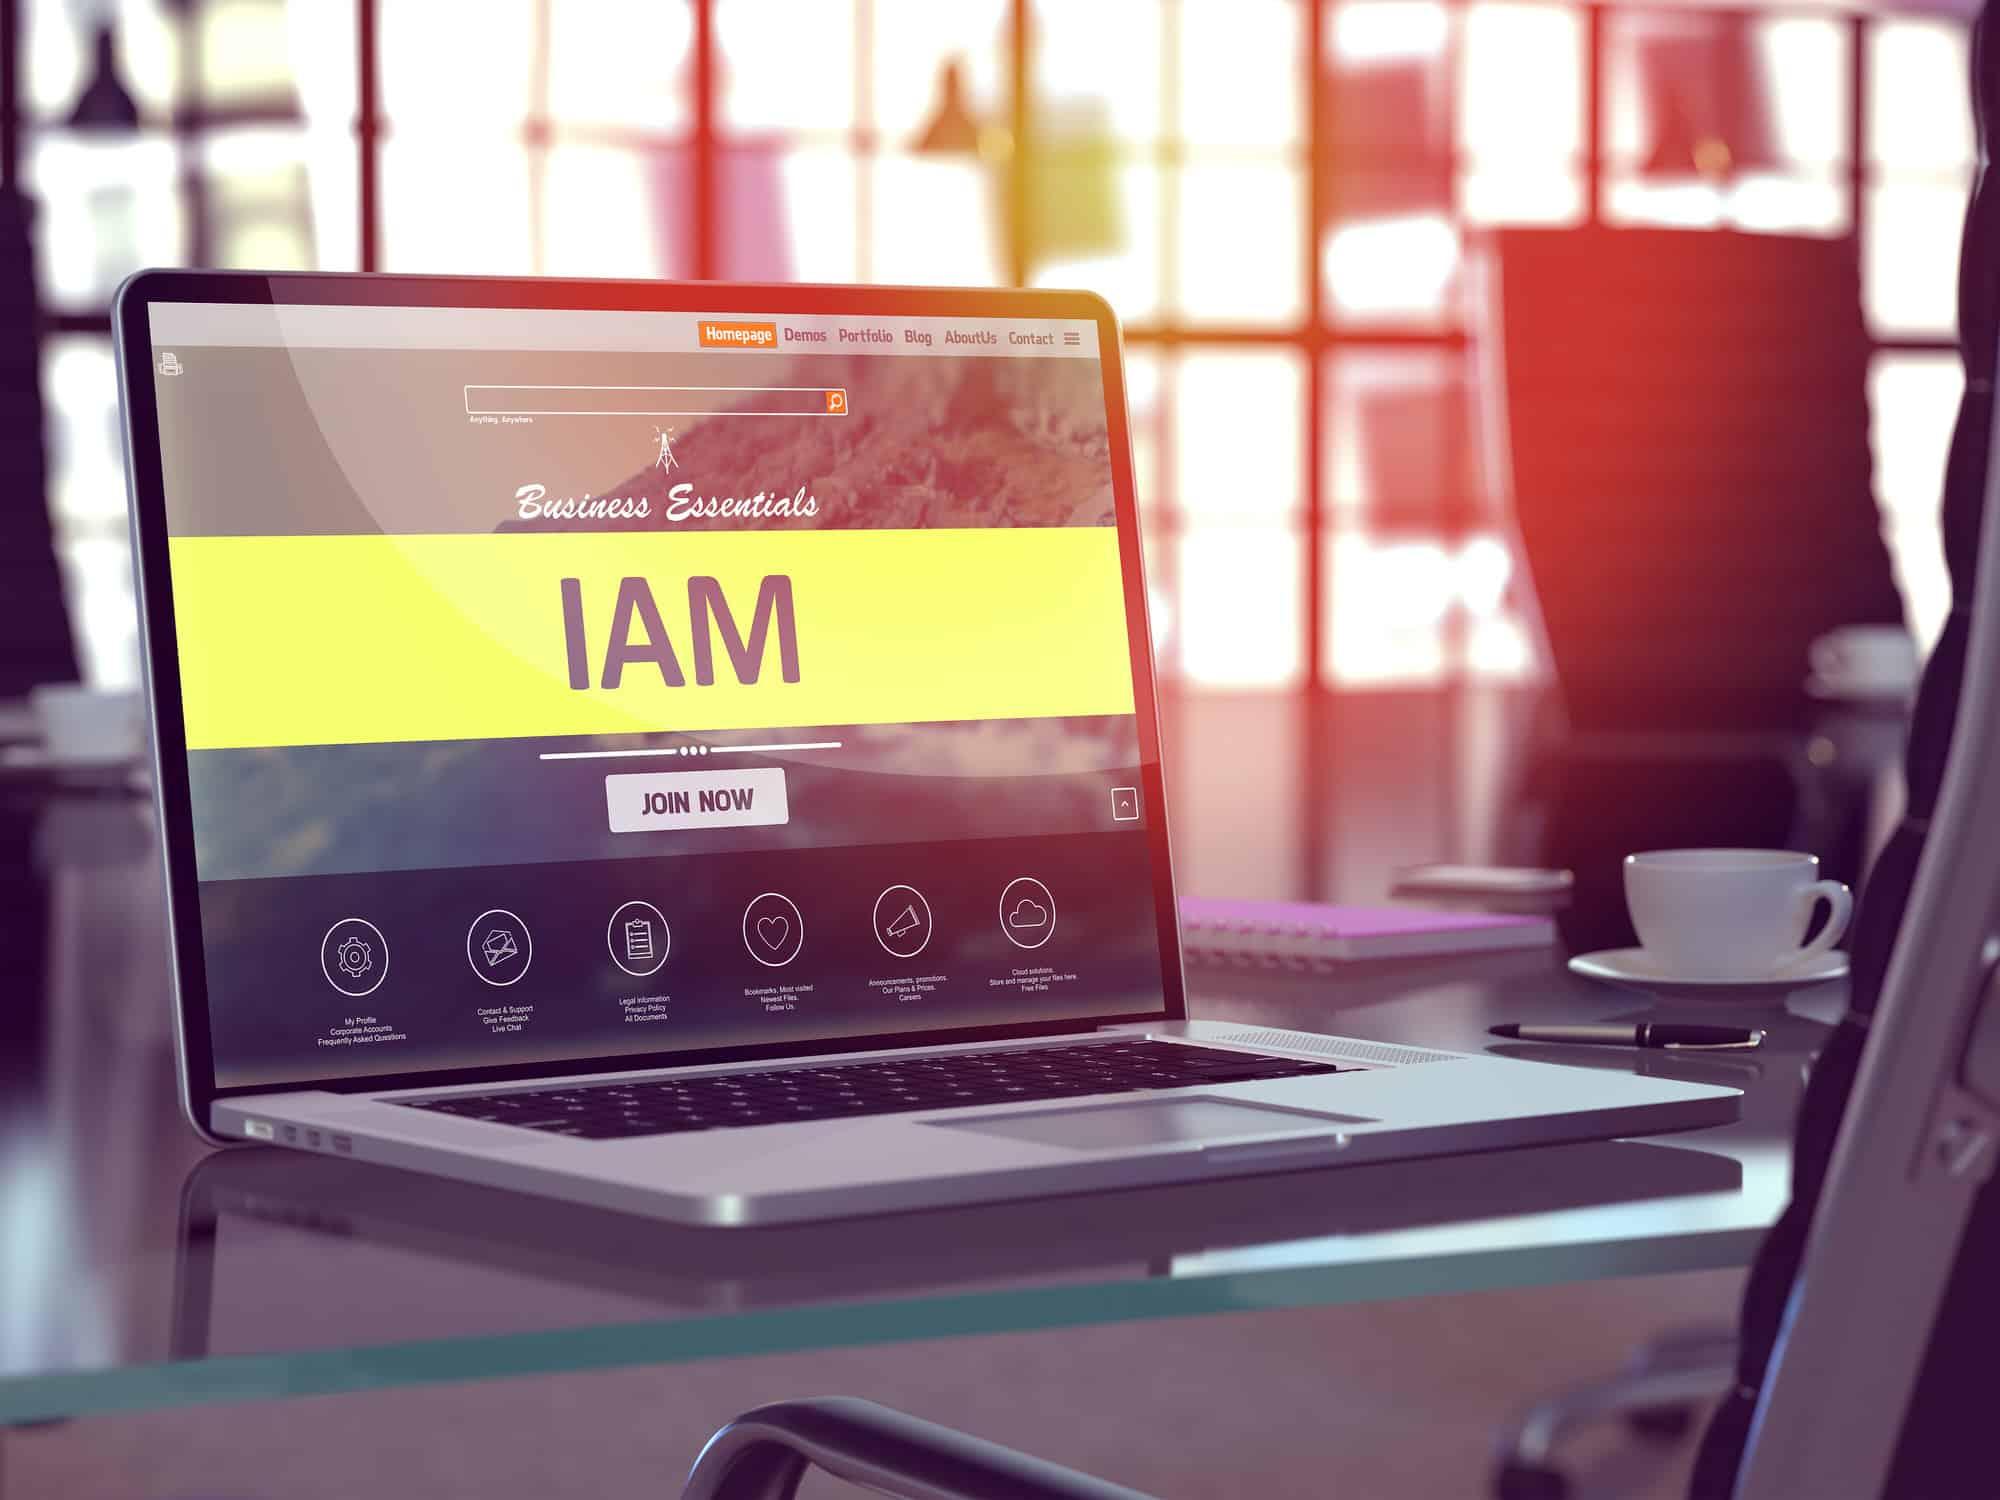 IAM-Systeme